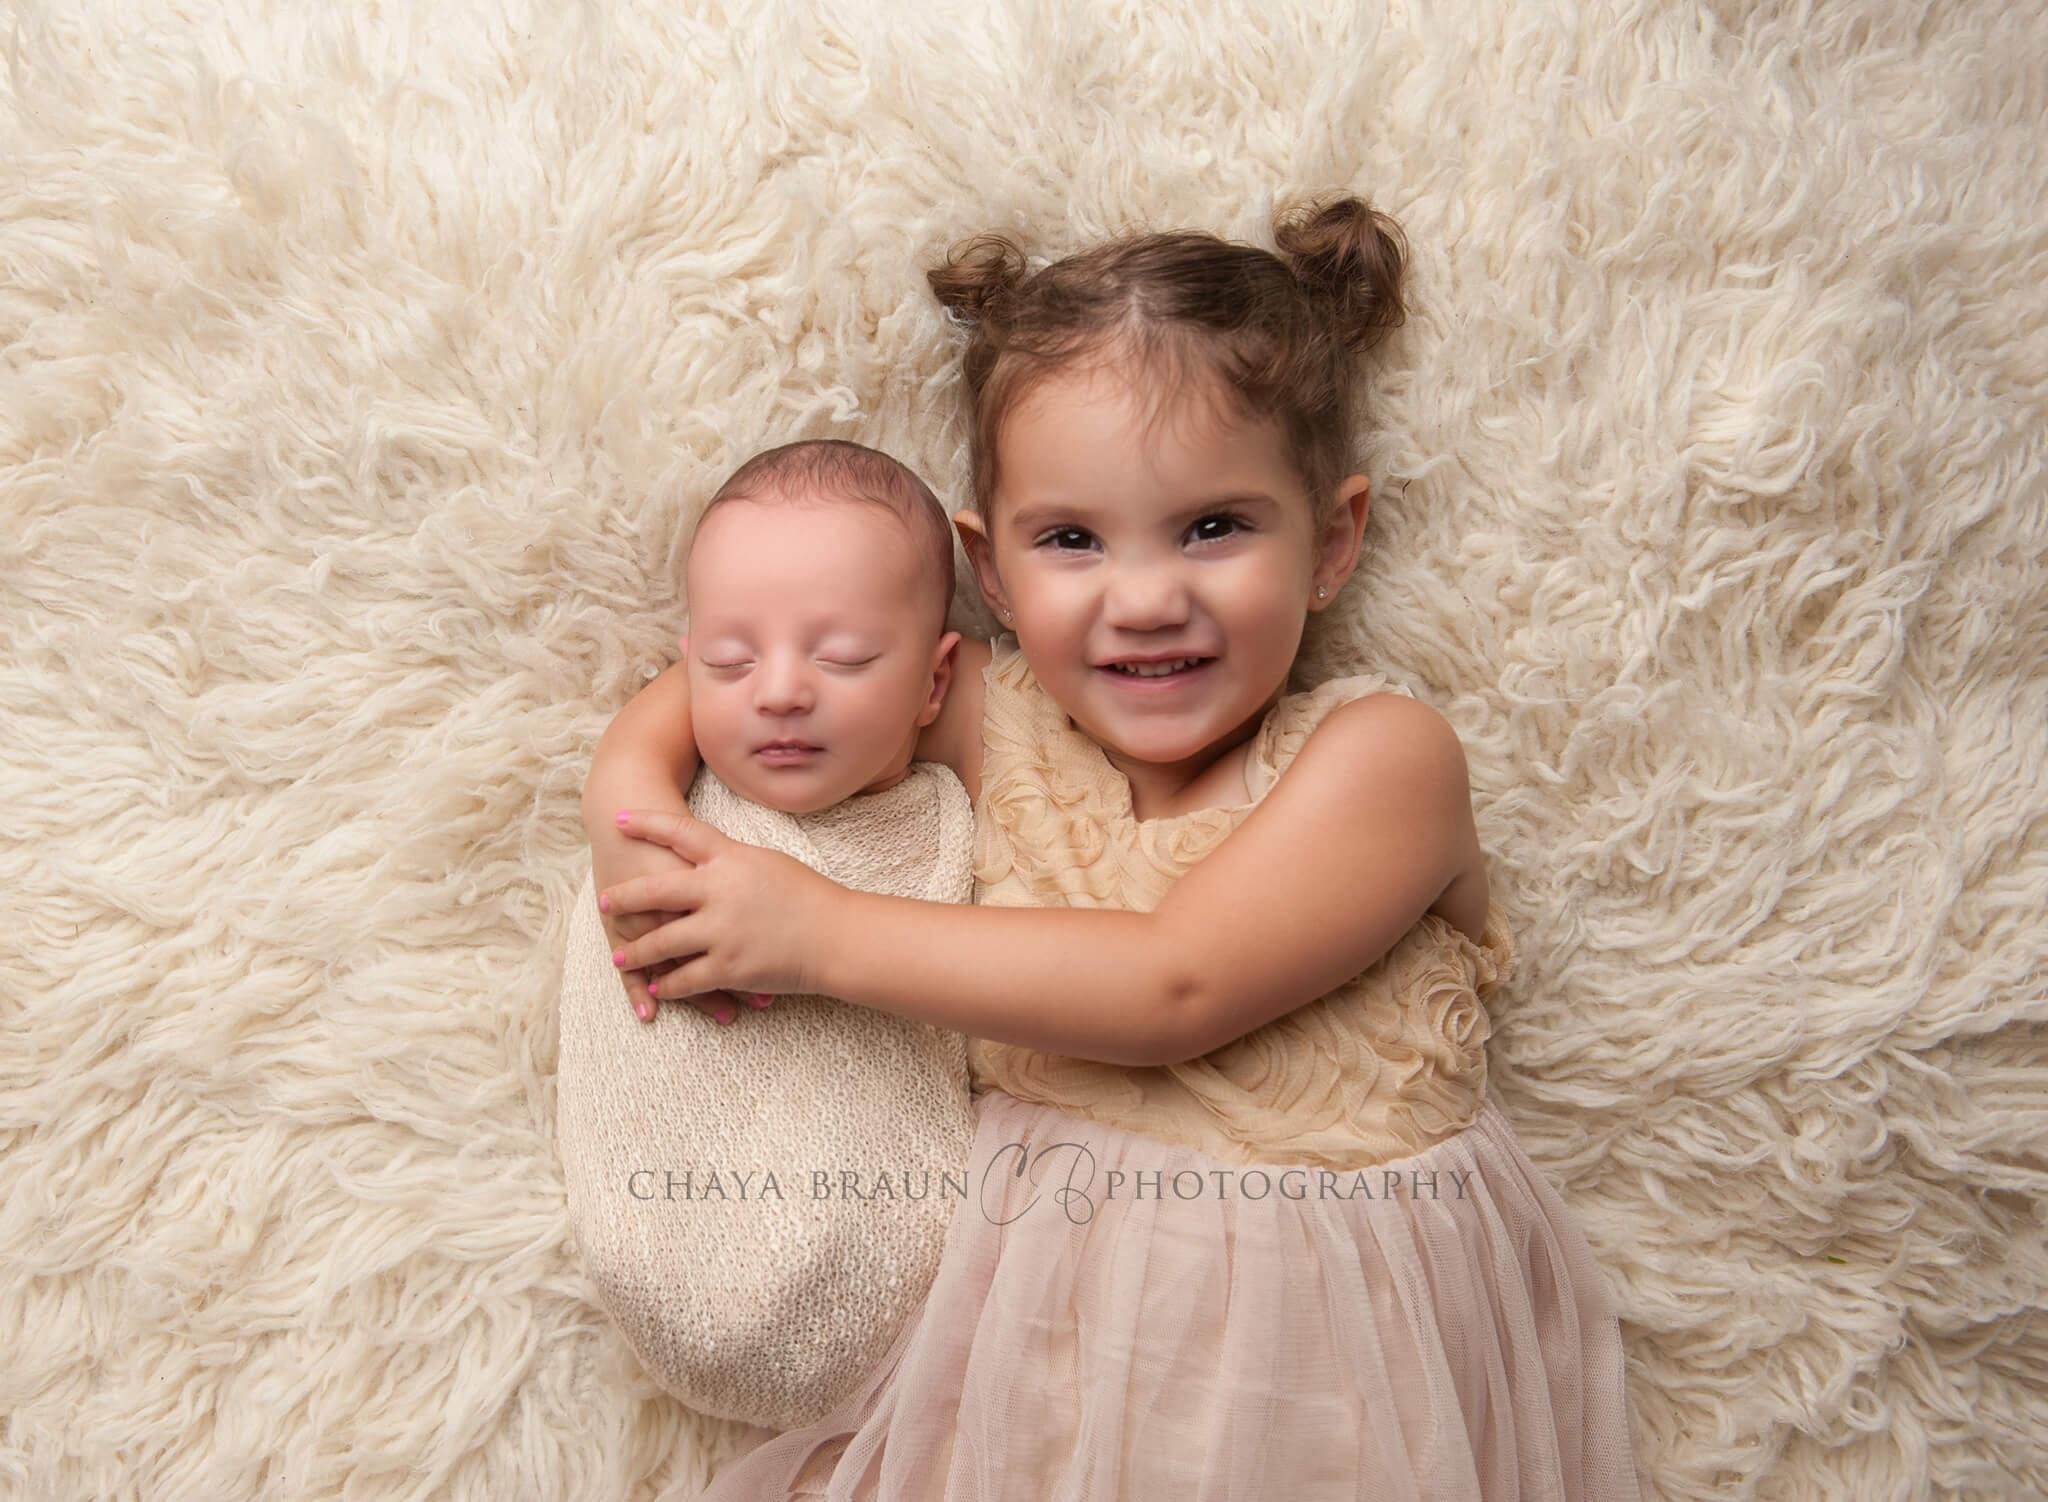 newborn baby and sister